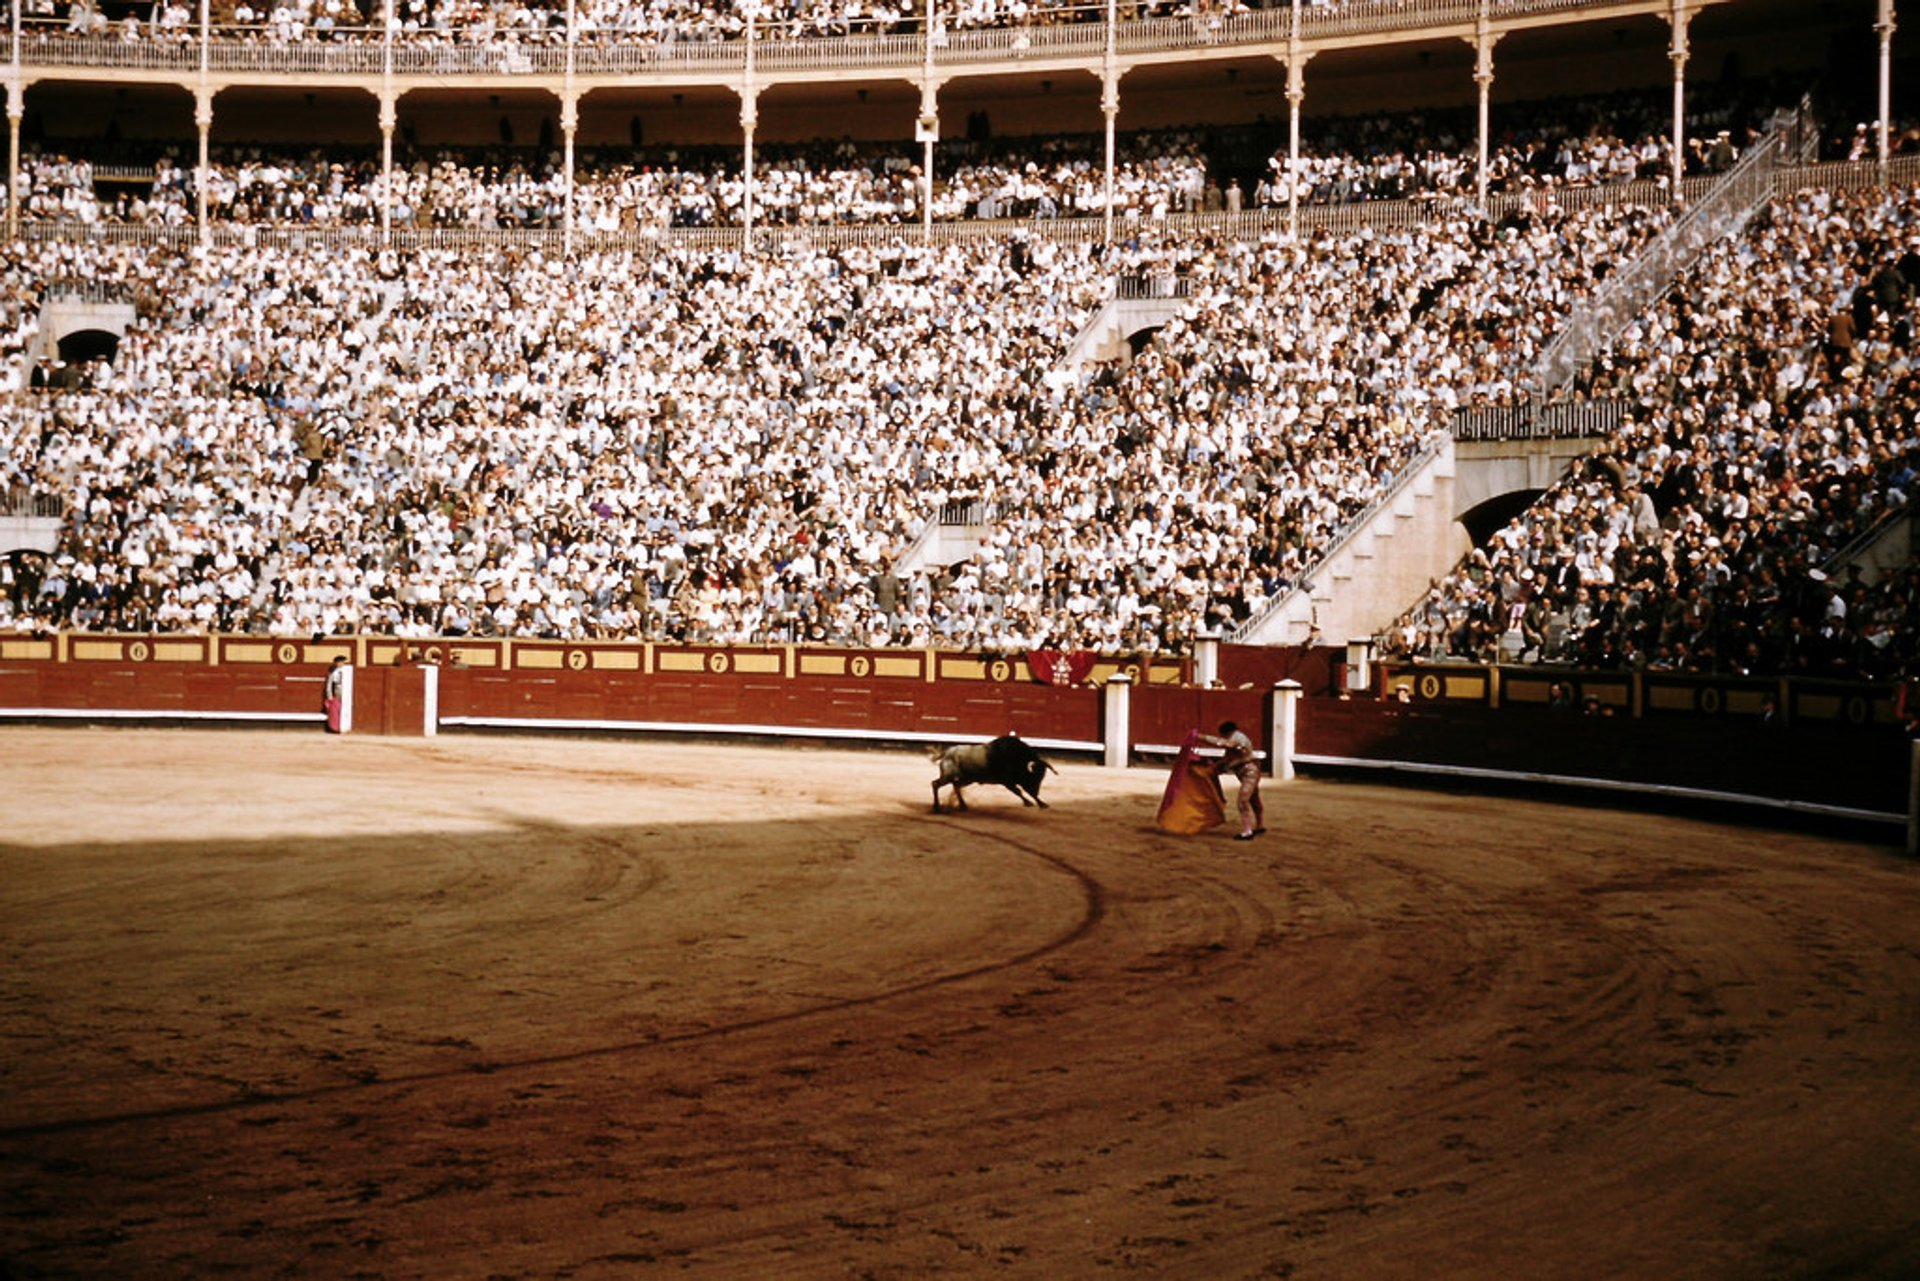 Best time for Bullfighting Season in Spain 2019